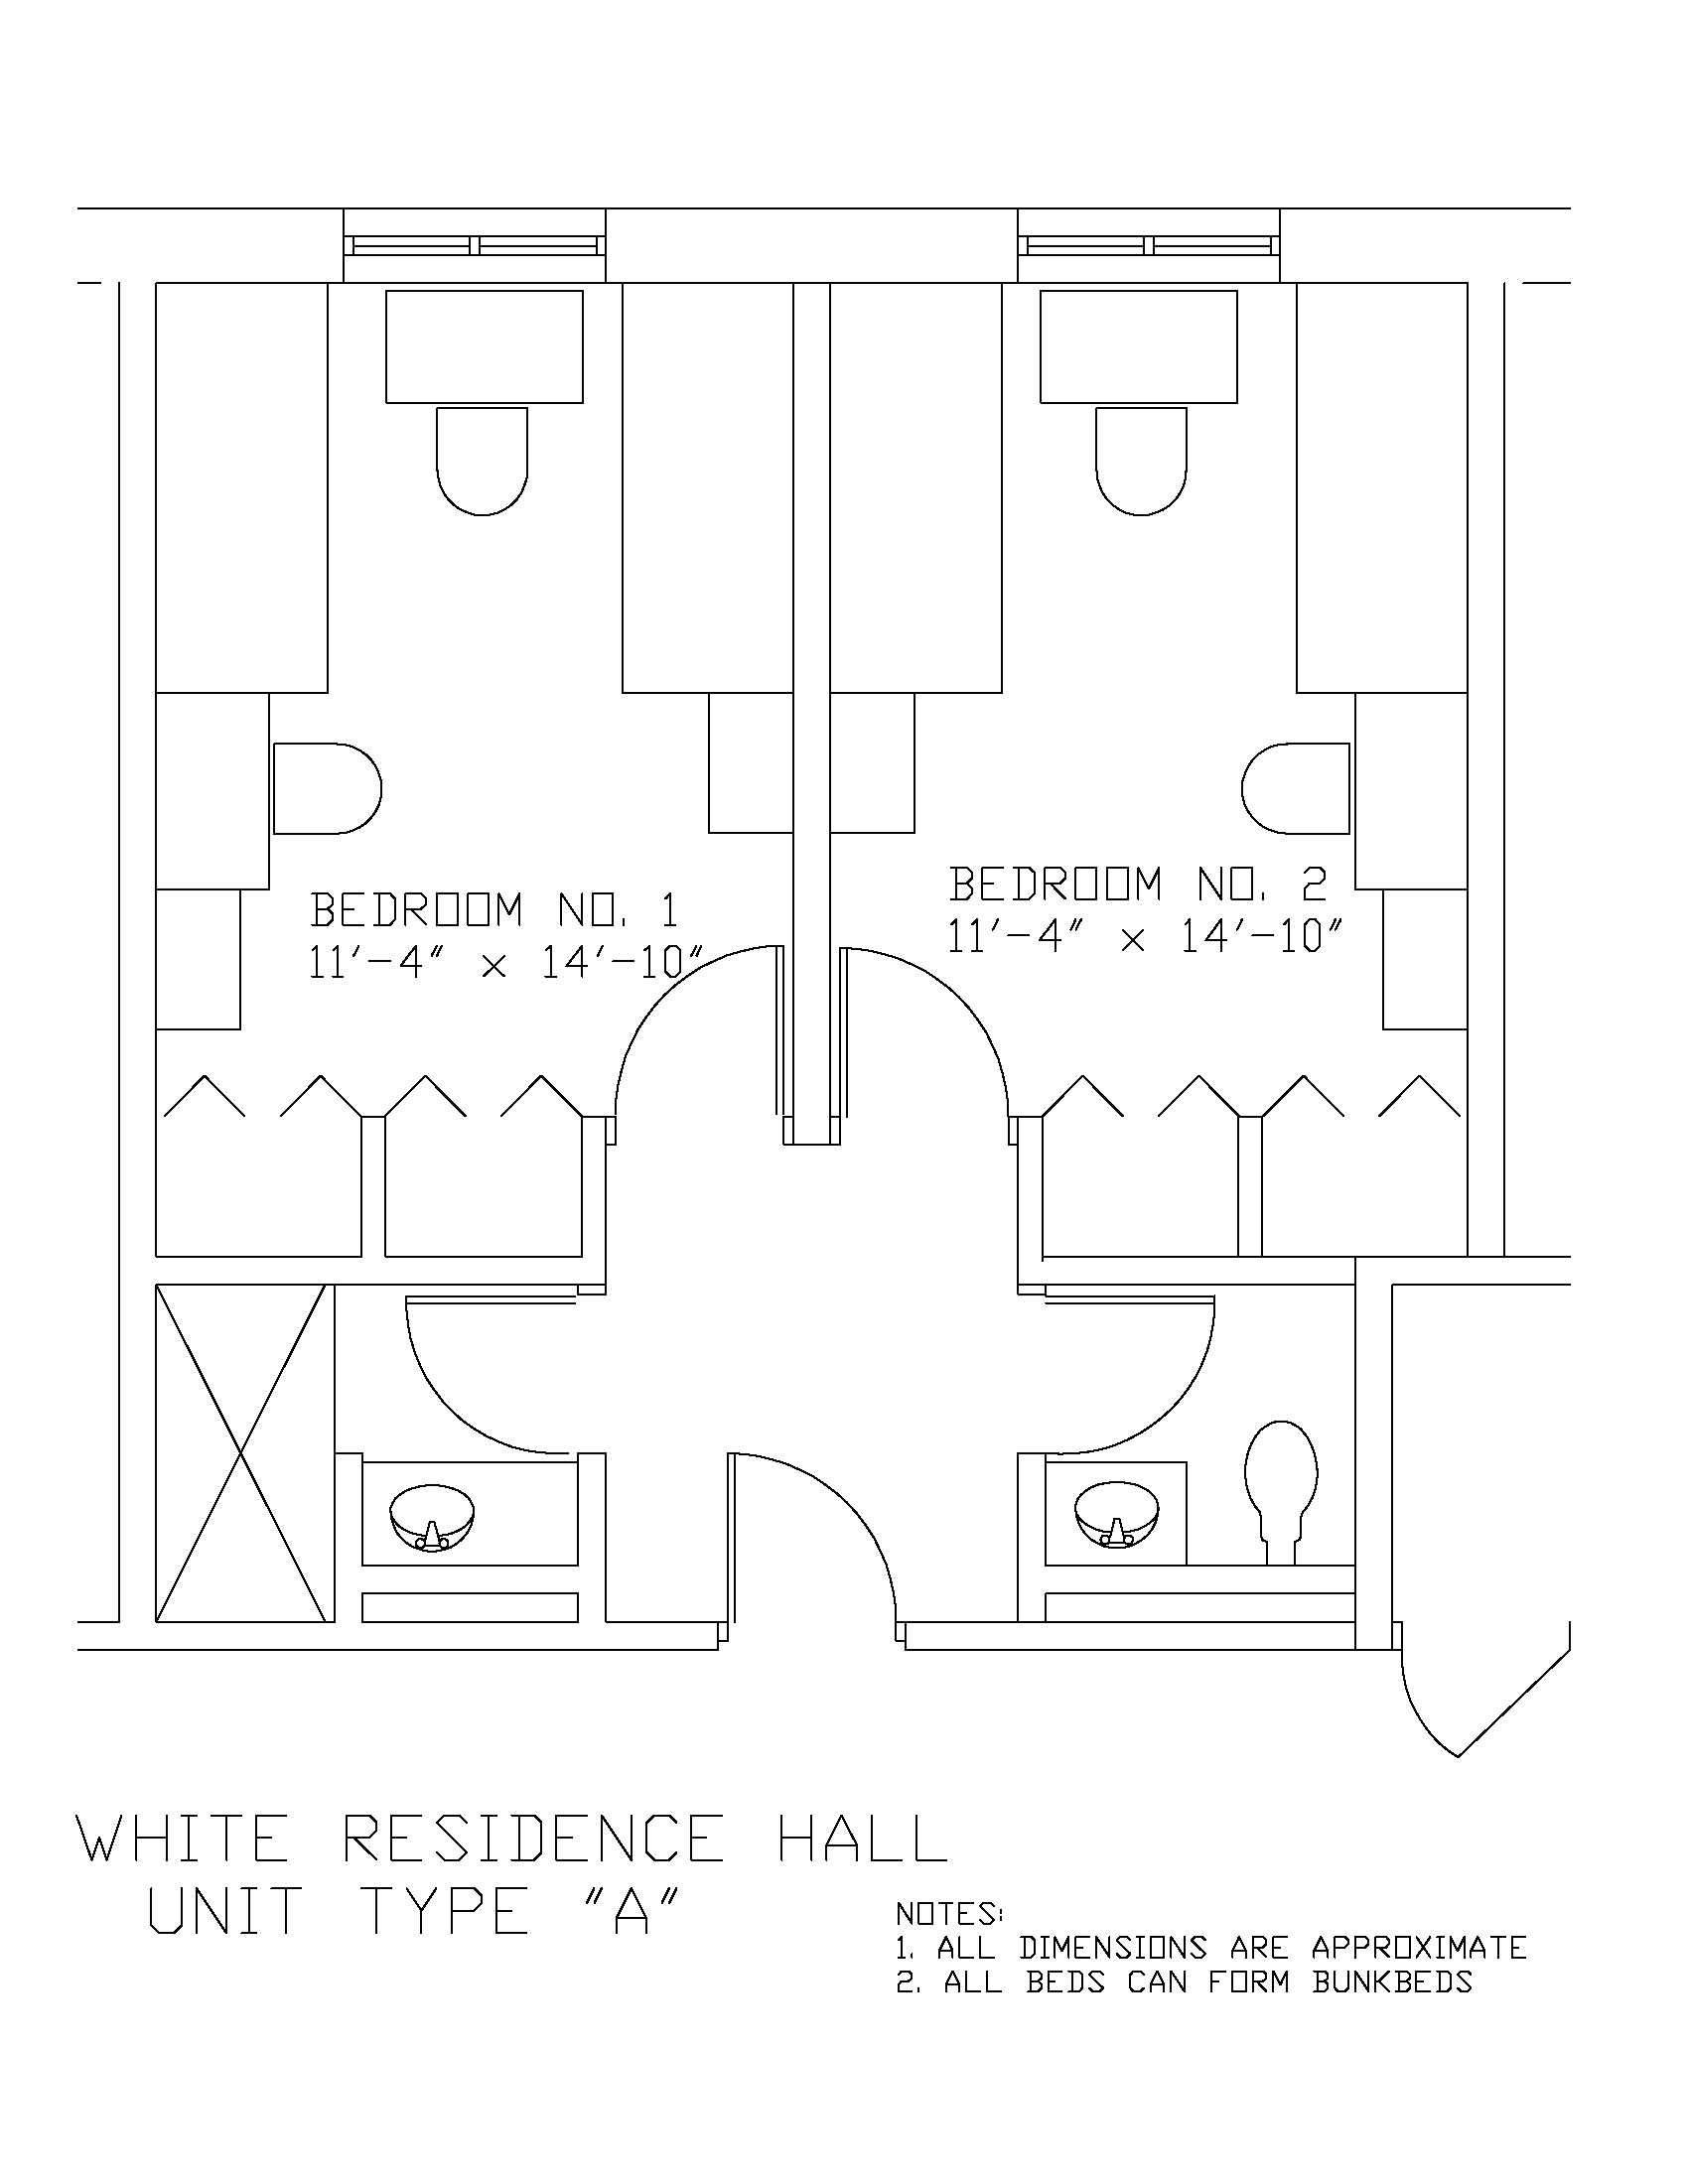 James S. White Hall: Type A